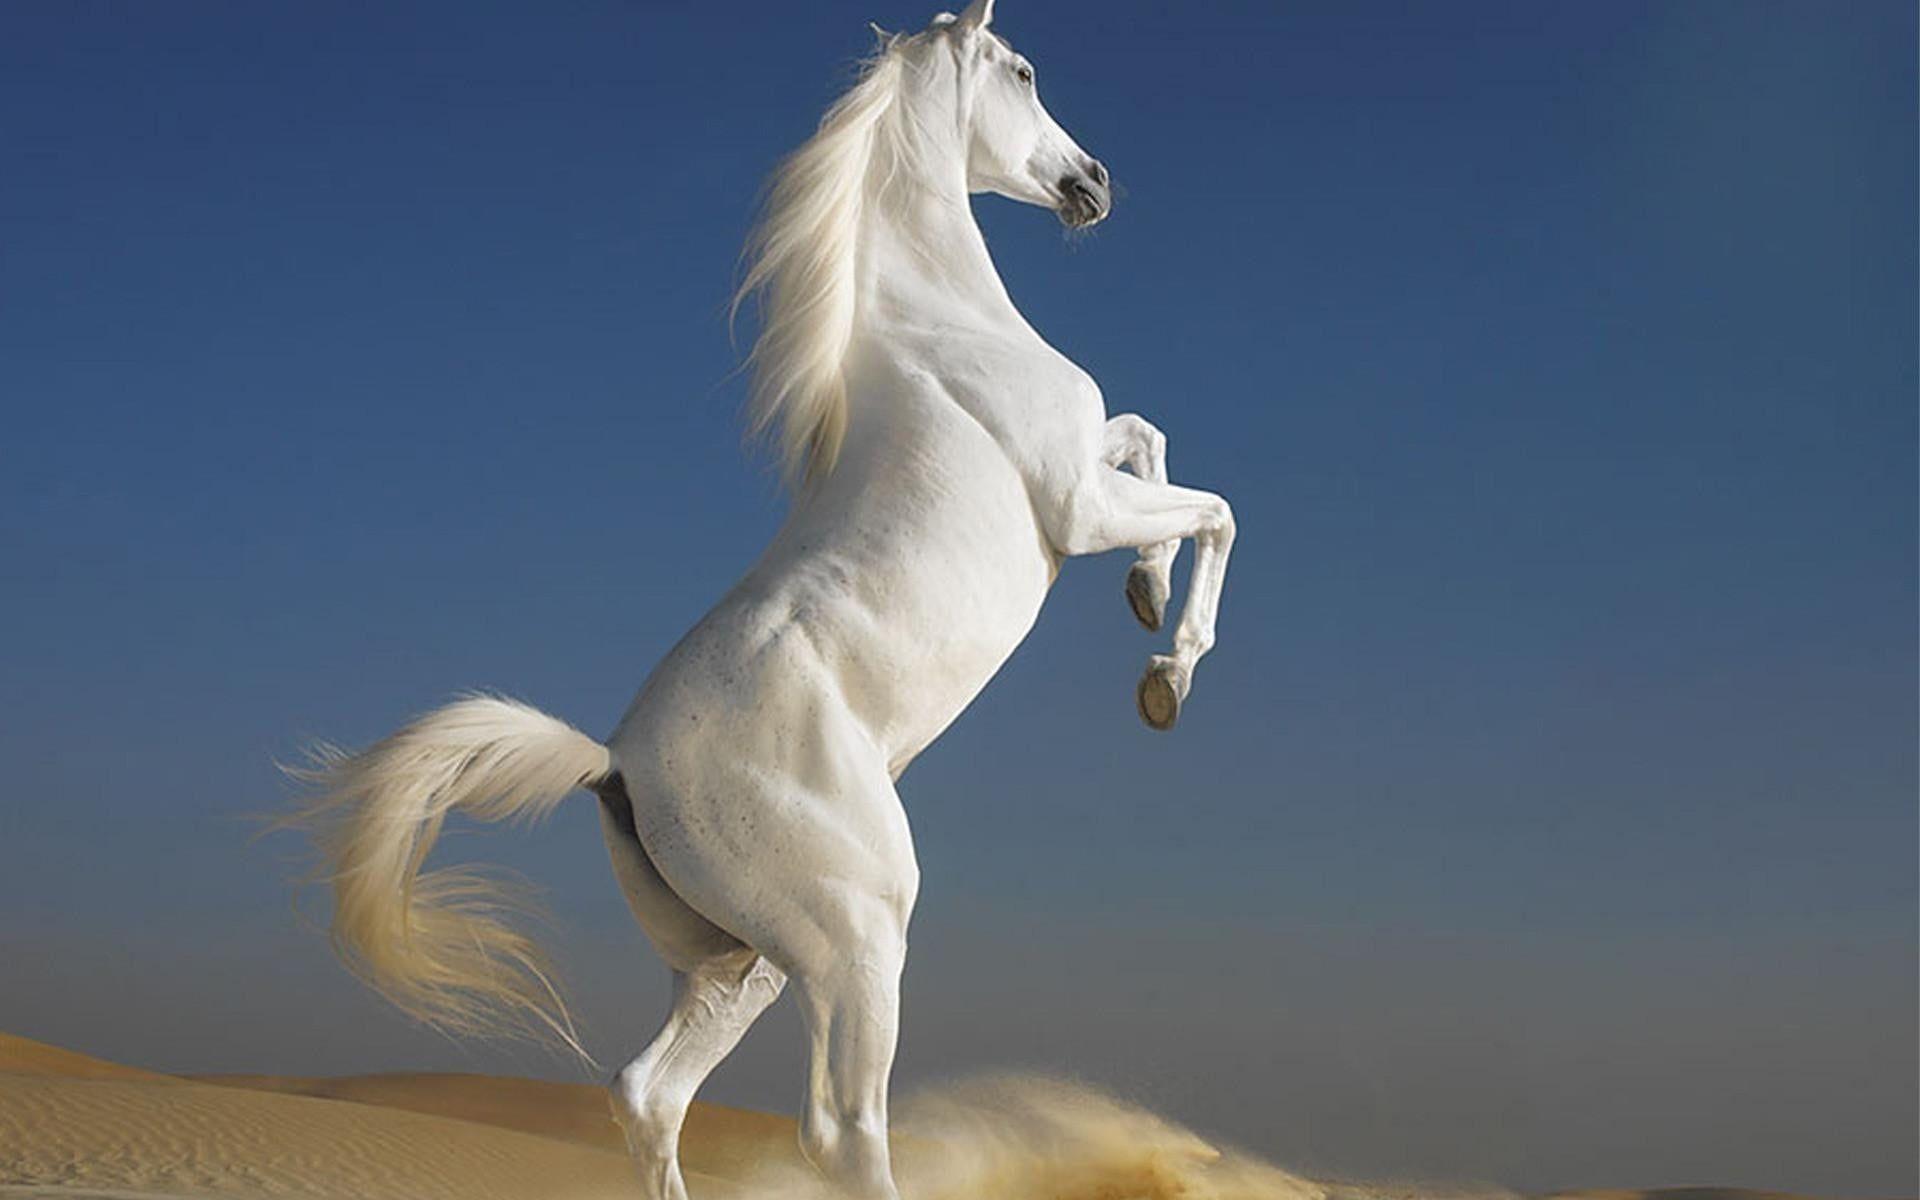 White Horse Horse White Desert Animals 1080p Wallpaper Hdwallpaper Desktop Horse Wallpaper Beautiful Horses Horse Background